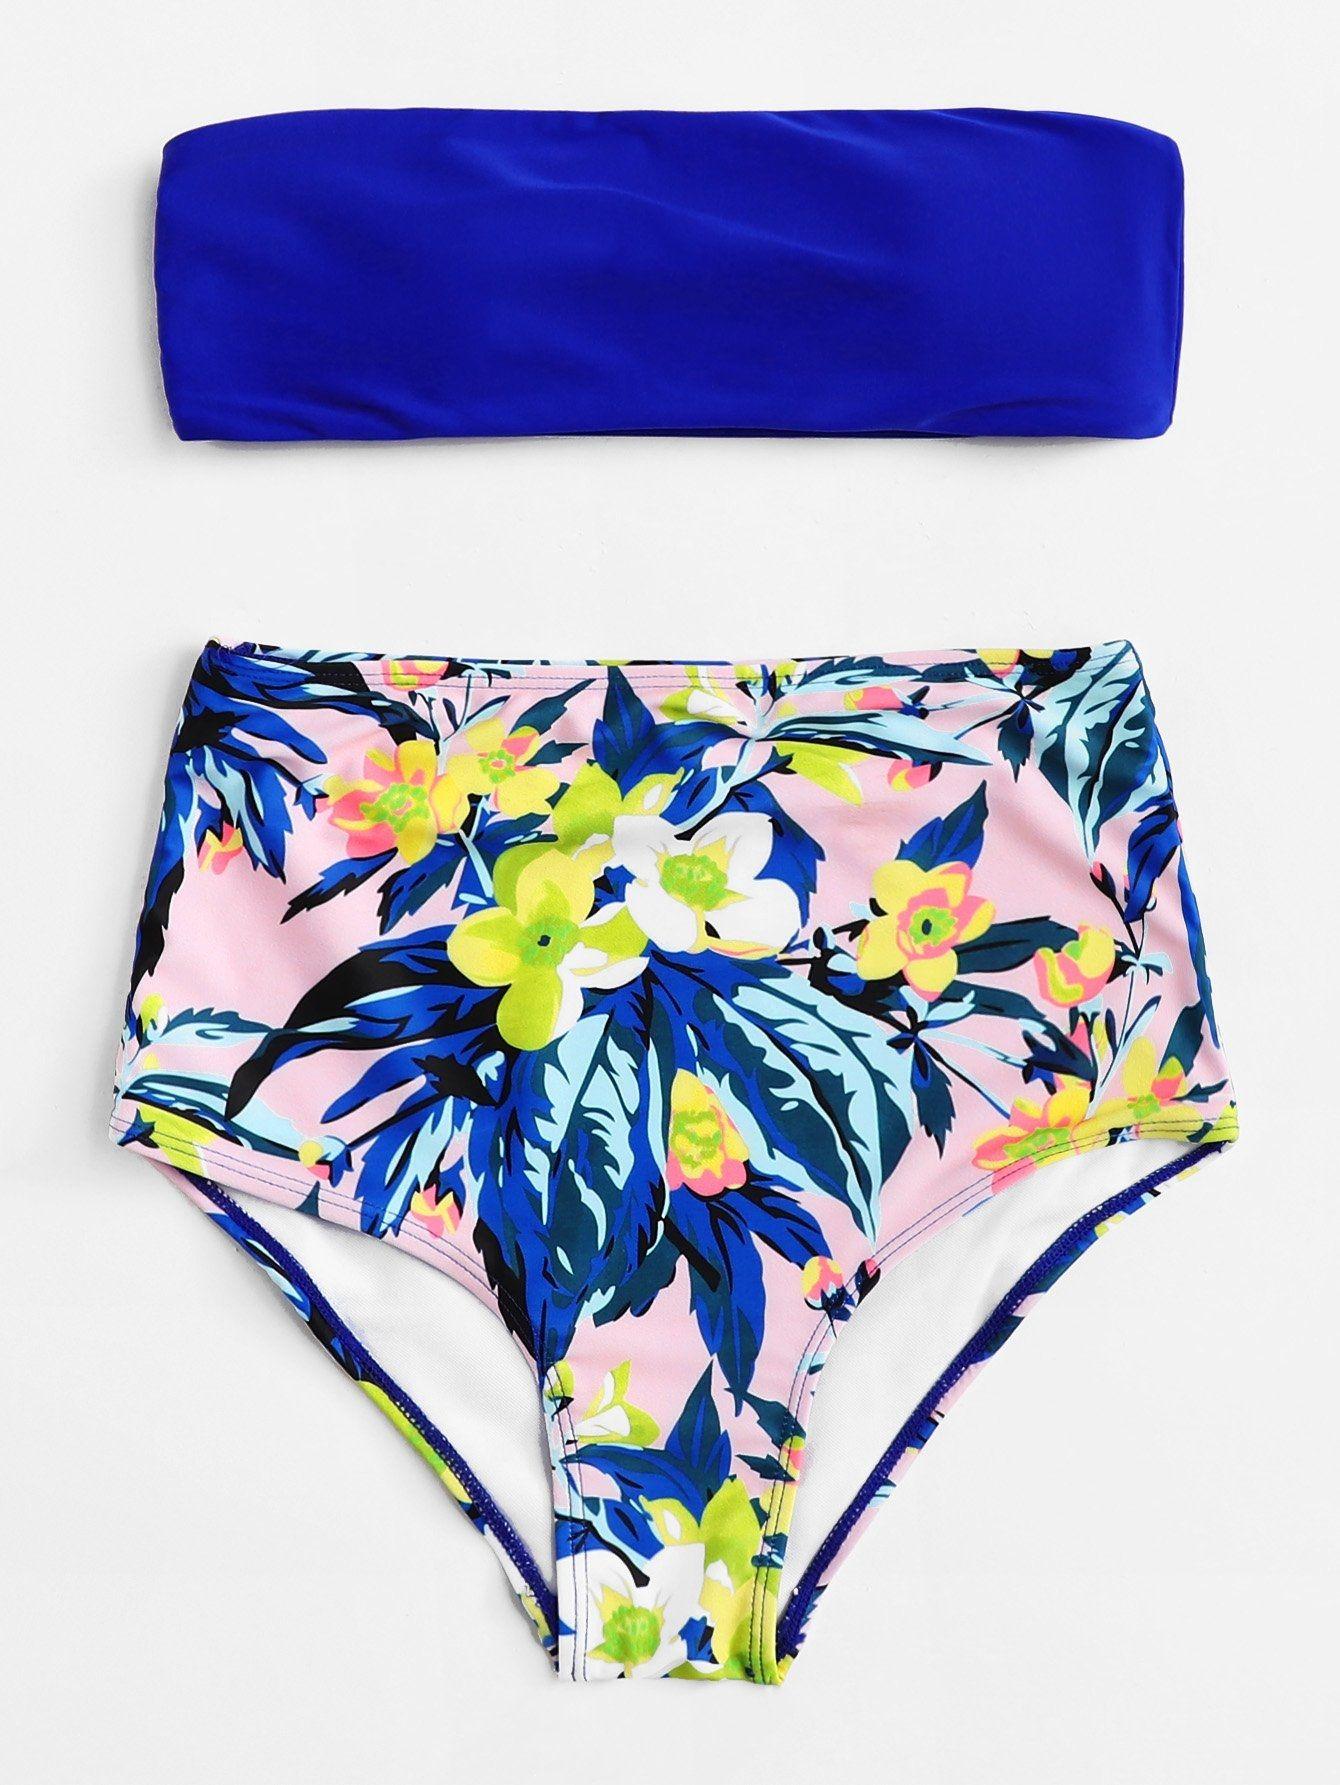 997238b6af82b SHEIN Floral Print High Waist Bikini Set Price in Egypt | Jumia ...